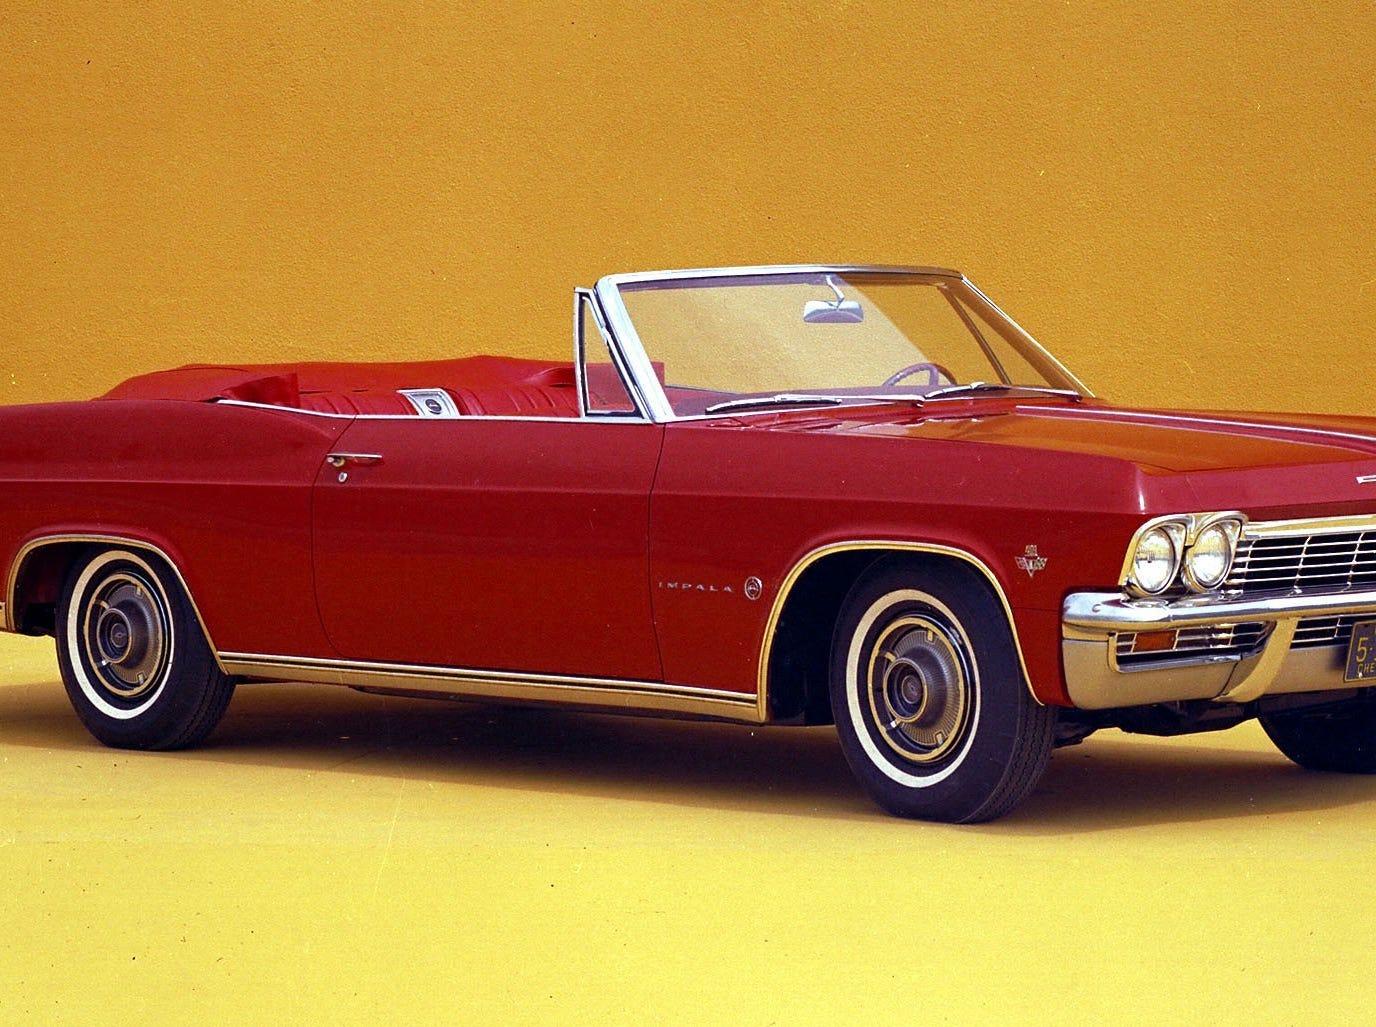 A 1965 Chevrolet Impala convertible.